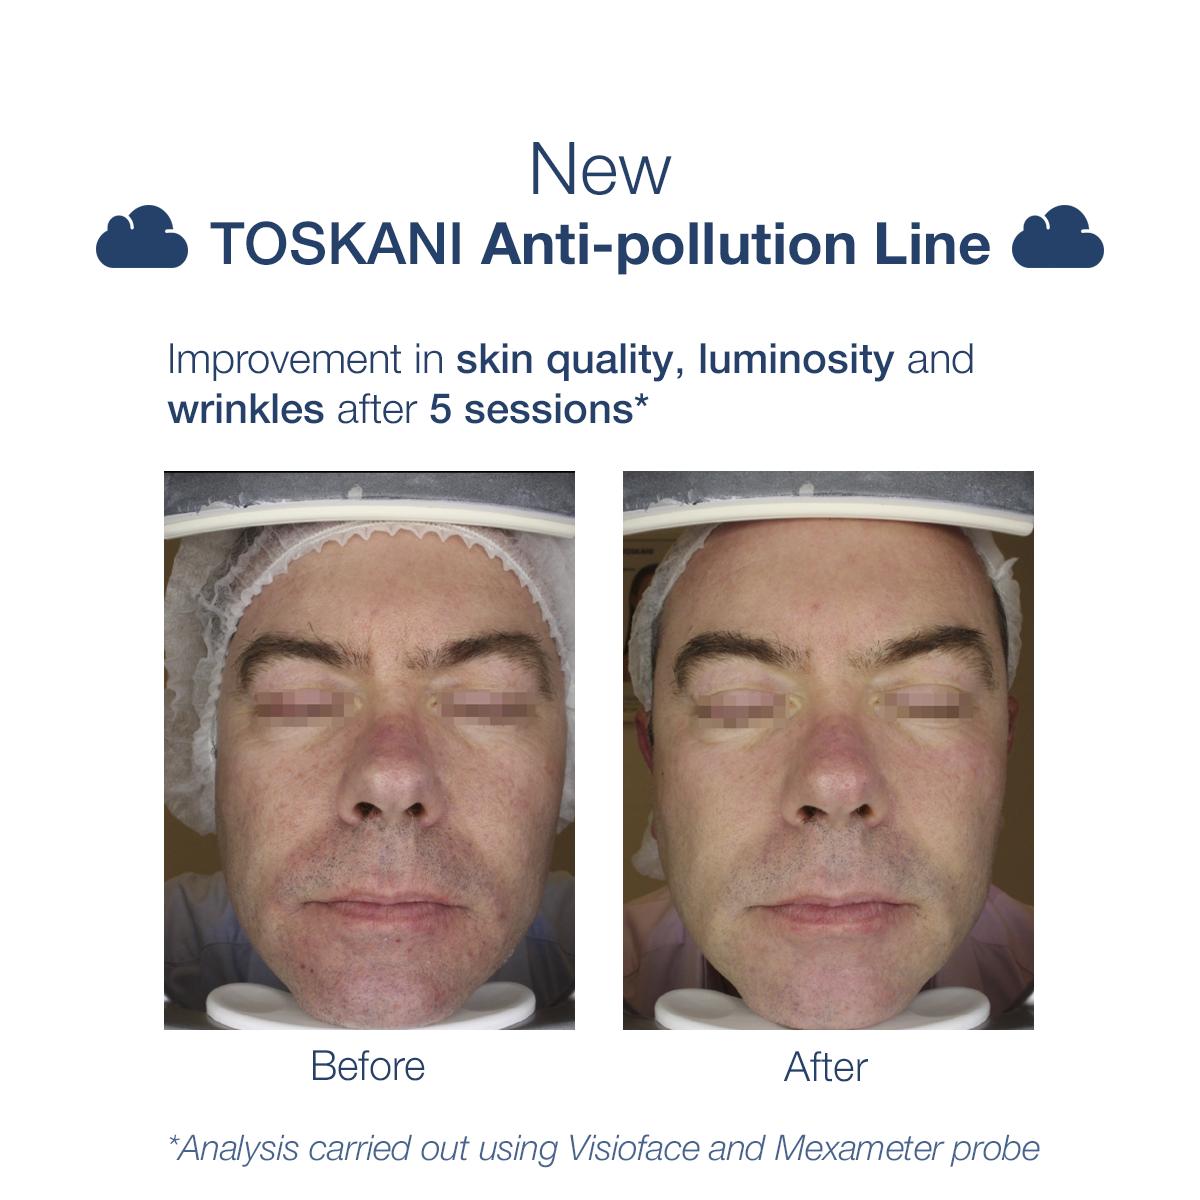 TKN_antipollutionline_b-a_4